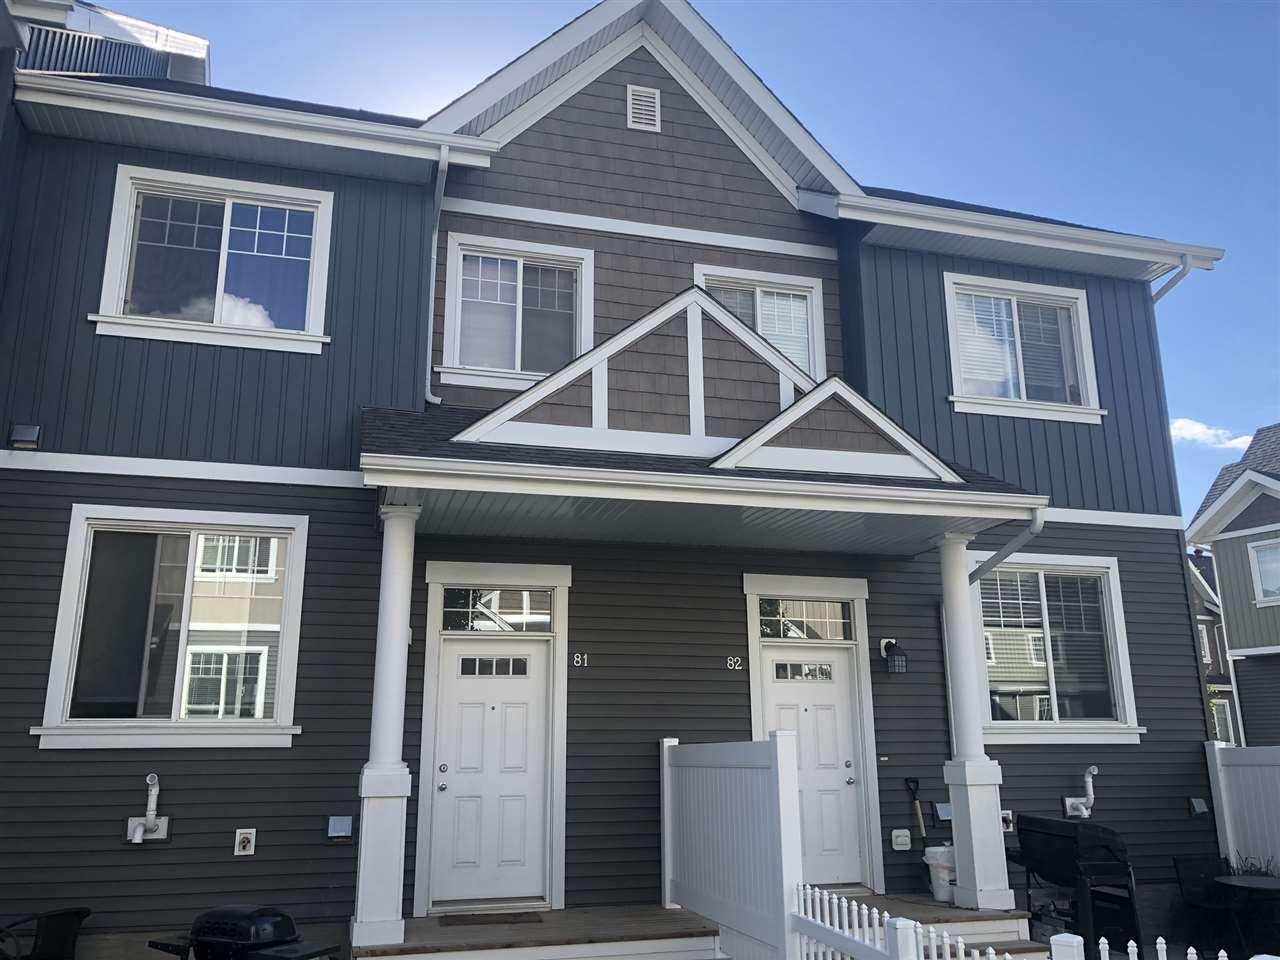 Main Photo: 81 4050 SAVARYN Drive in Edmonton: Zone 53 Townhouse for sale : MLS®# E4225032